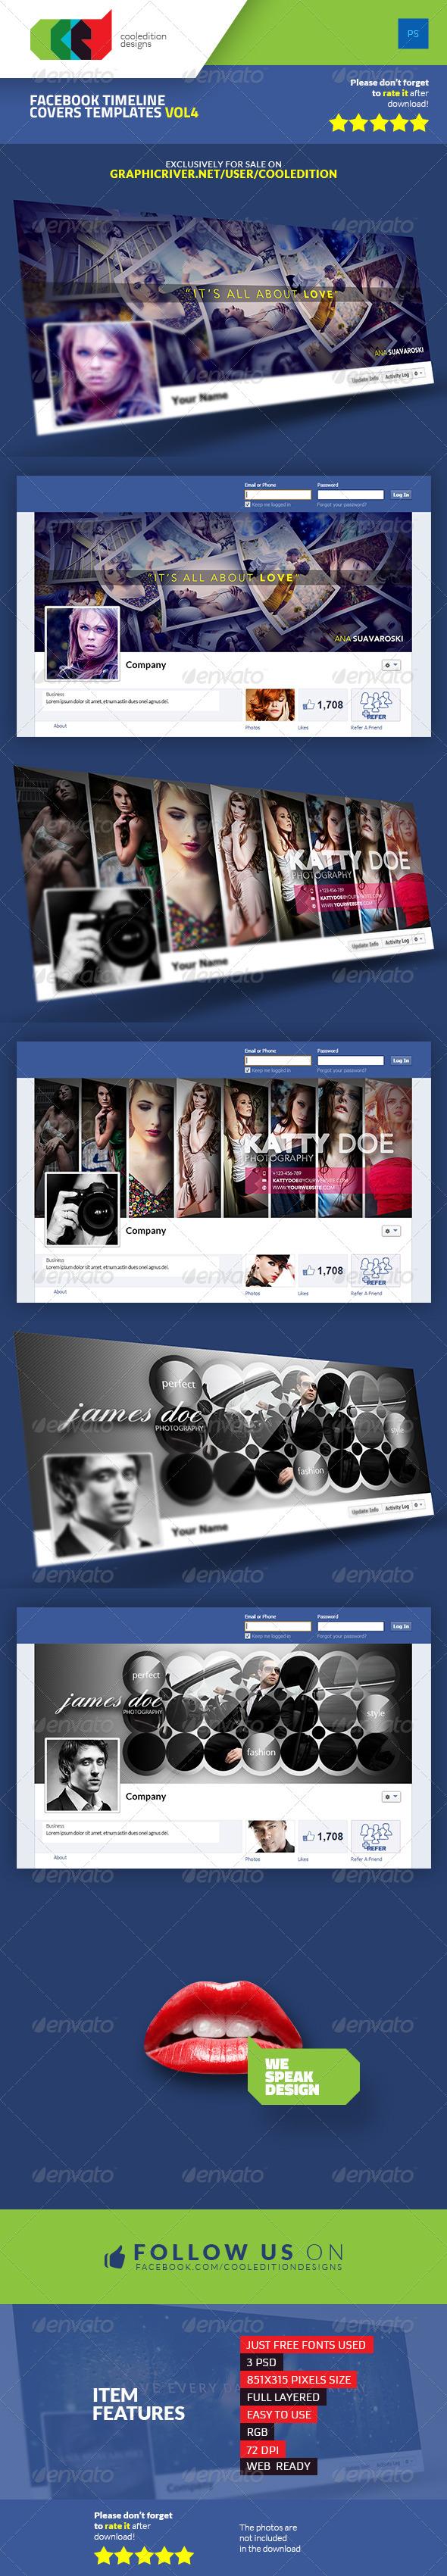 Facebook Timeline Covers Templates VOL4 - Facebook Timeline Covers Social Media